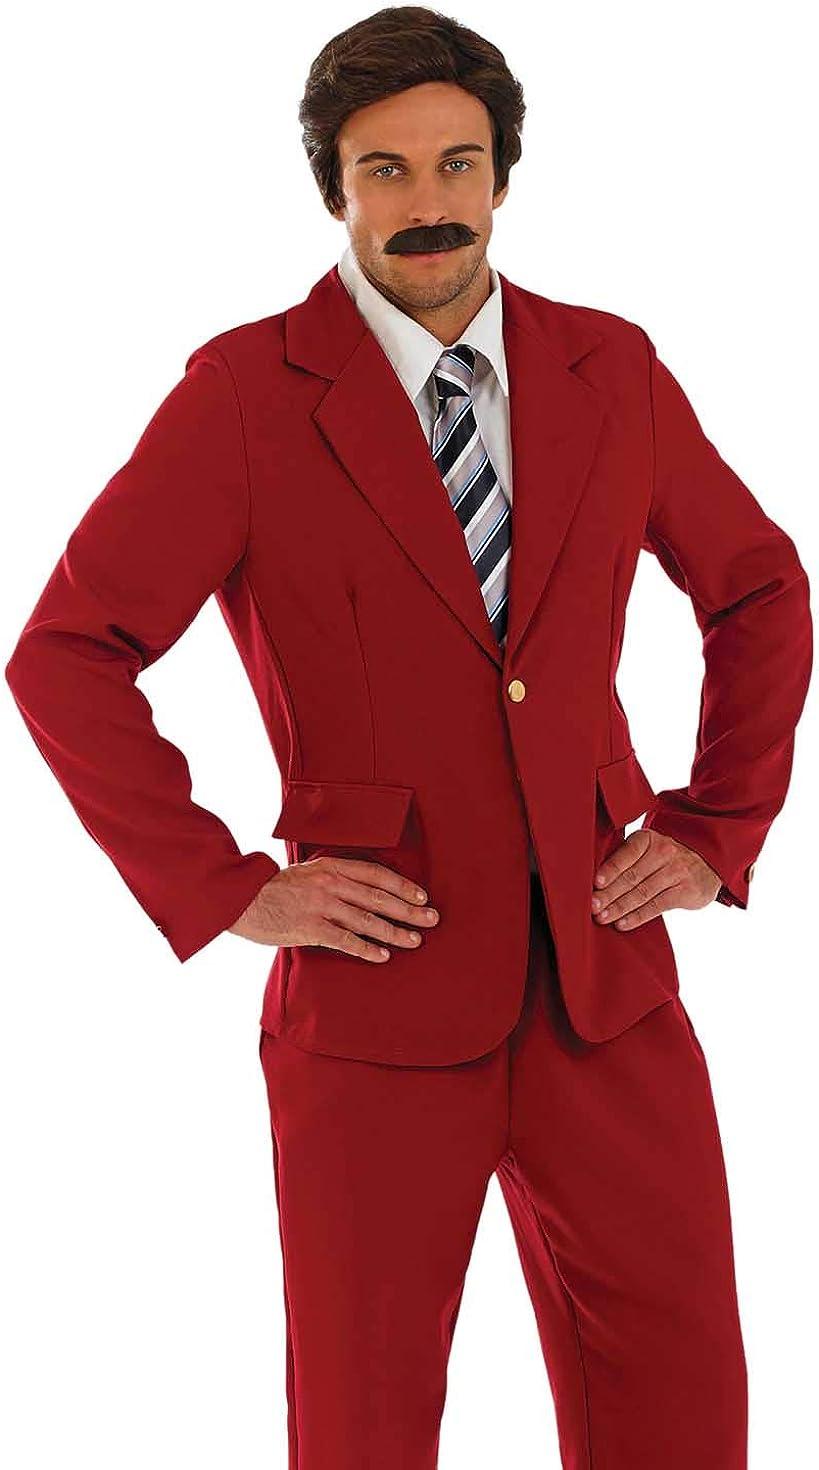 Mens News Reader Newsreader Tv Film Famous Fancy Dress Costume Outfit M L XL